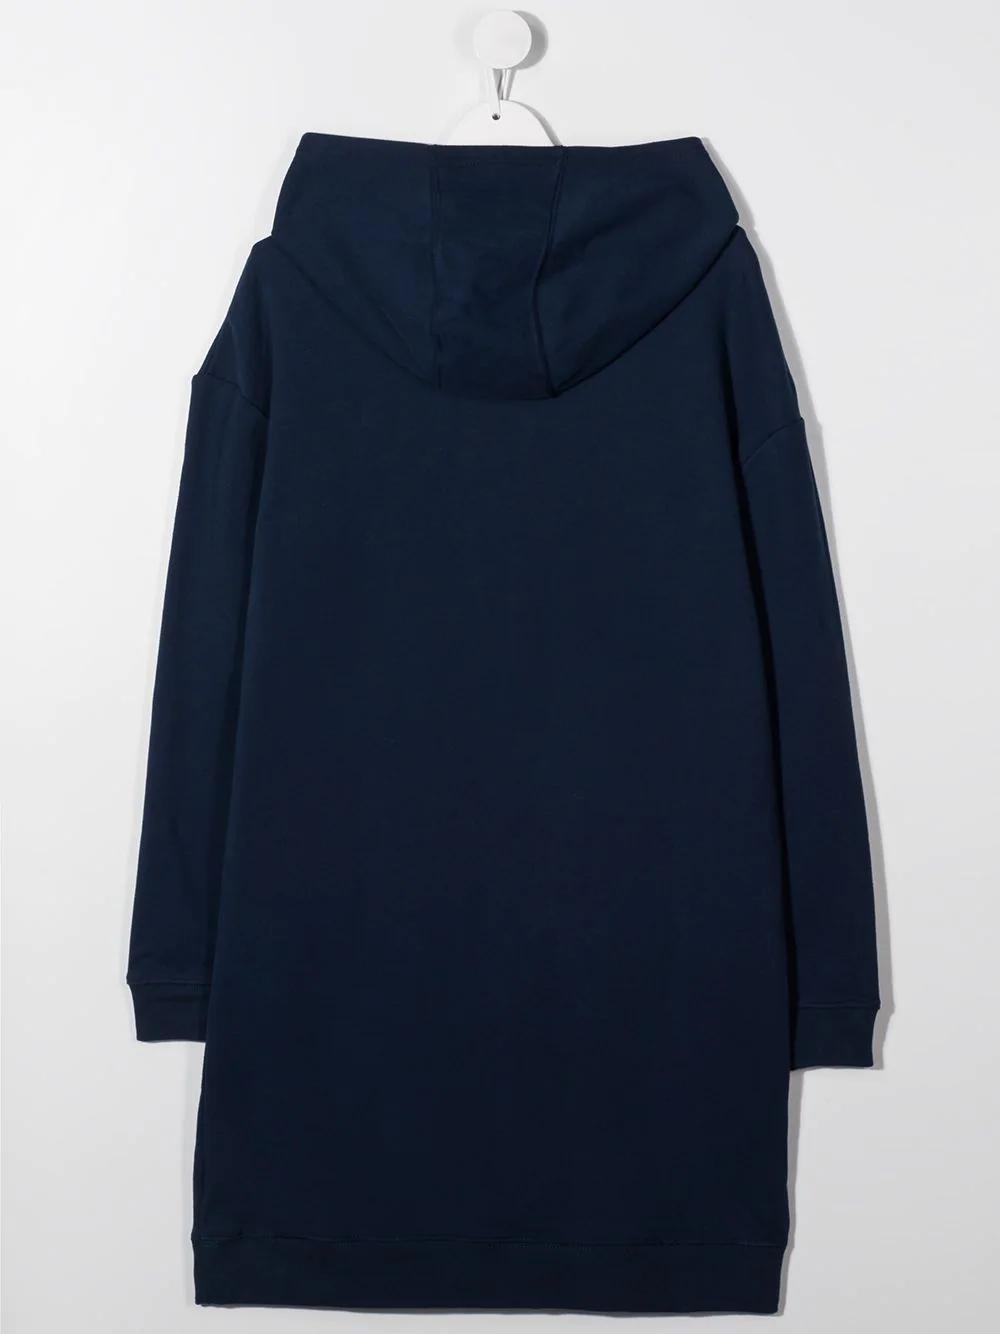 Dress Little Marc Jacobs  LITTLE MARC JACOBS   11   W1233584N